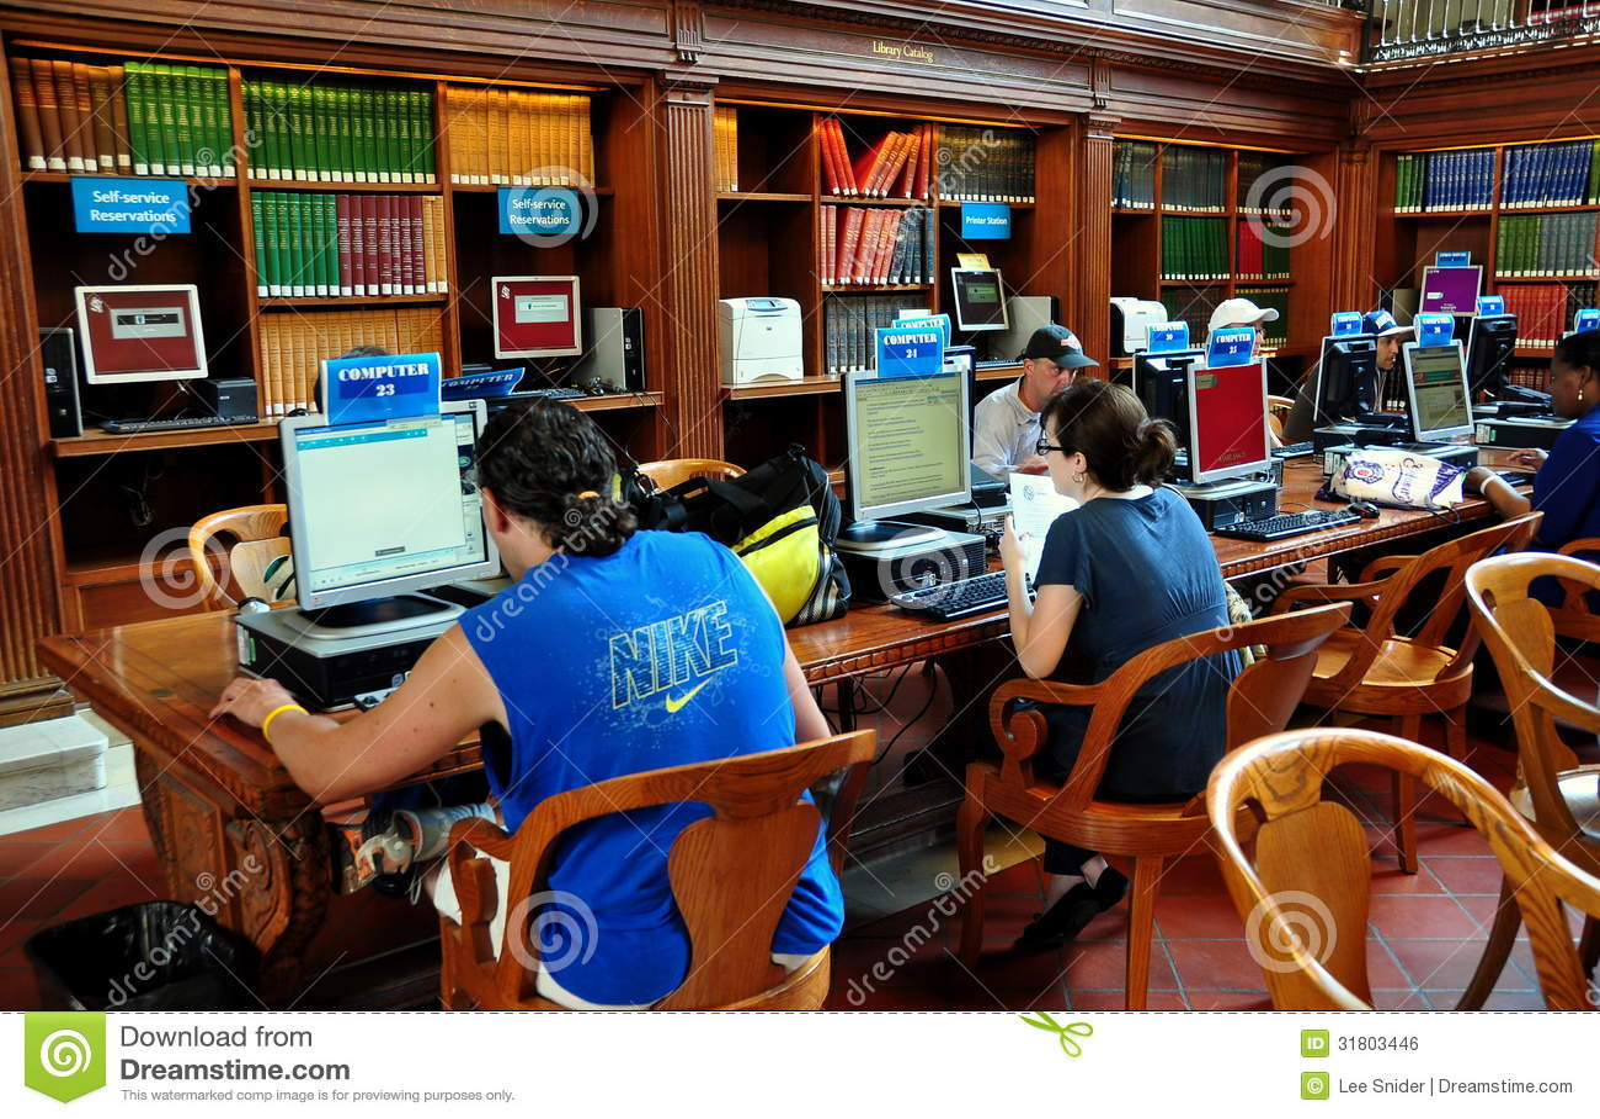 NYC :使用计算机的人们在NY公立图书馆